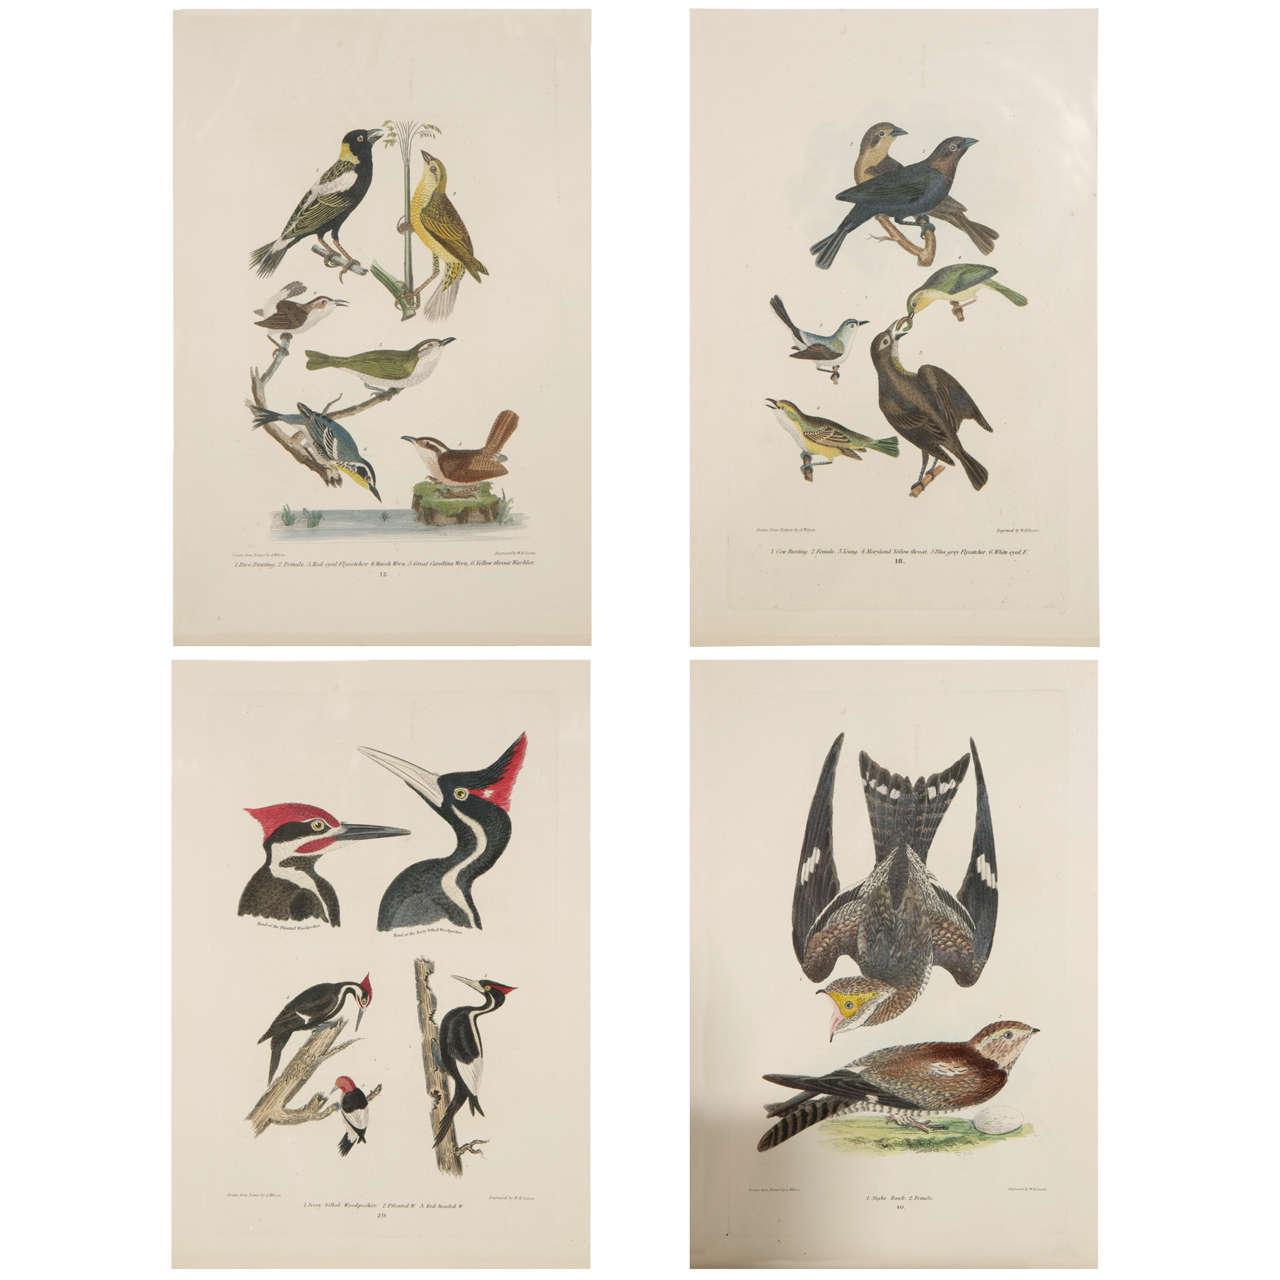 19th c. Framed Bird Prints For Sale at 1stdibs